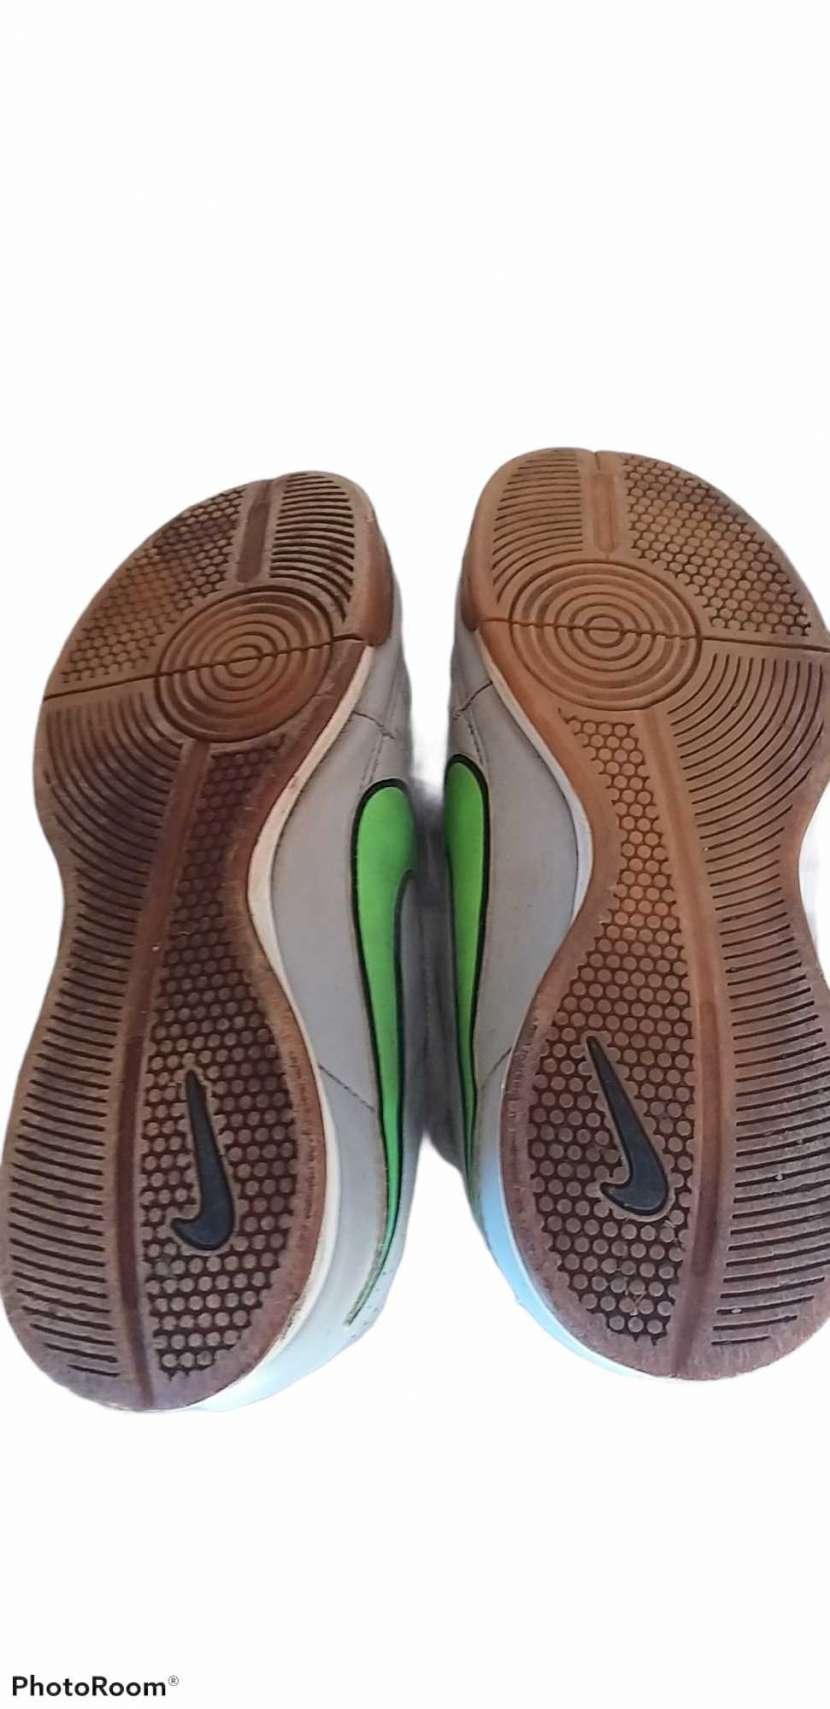 Calzado Nike Tiempo para futsal calce 38 - 1